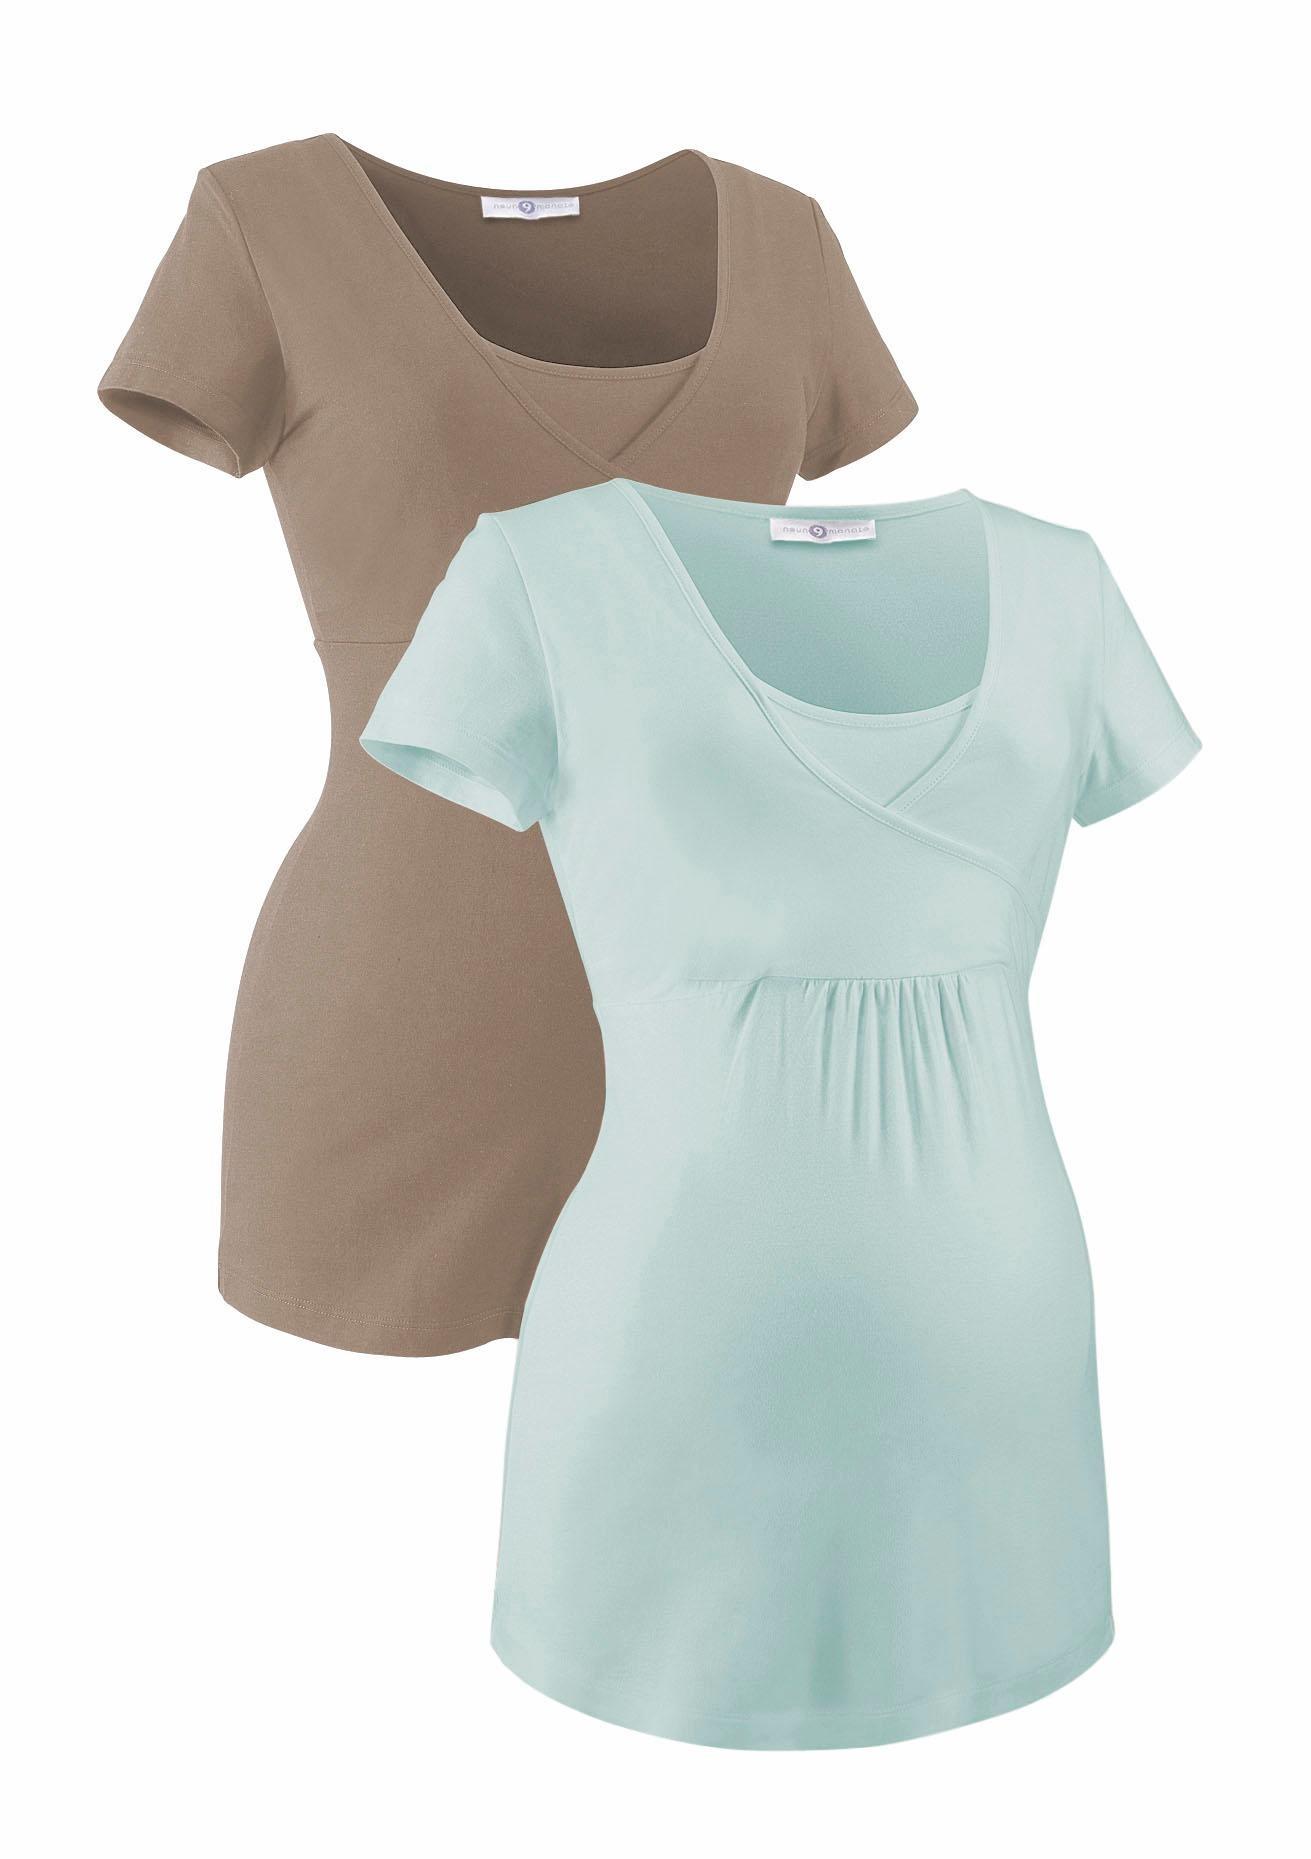 Neun Monate Umstandsshirt (Packung 2 tlg) | Bekleidung > Umstandsmode > Umstandsshirts | neun monate